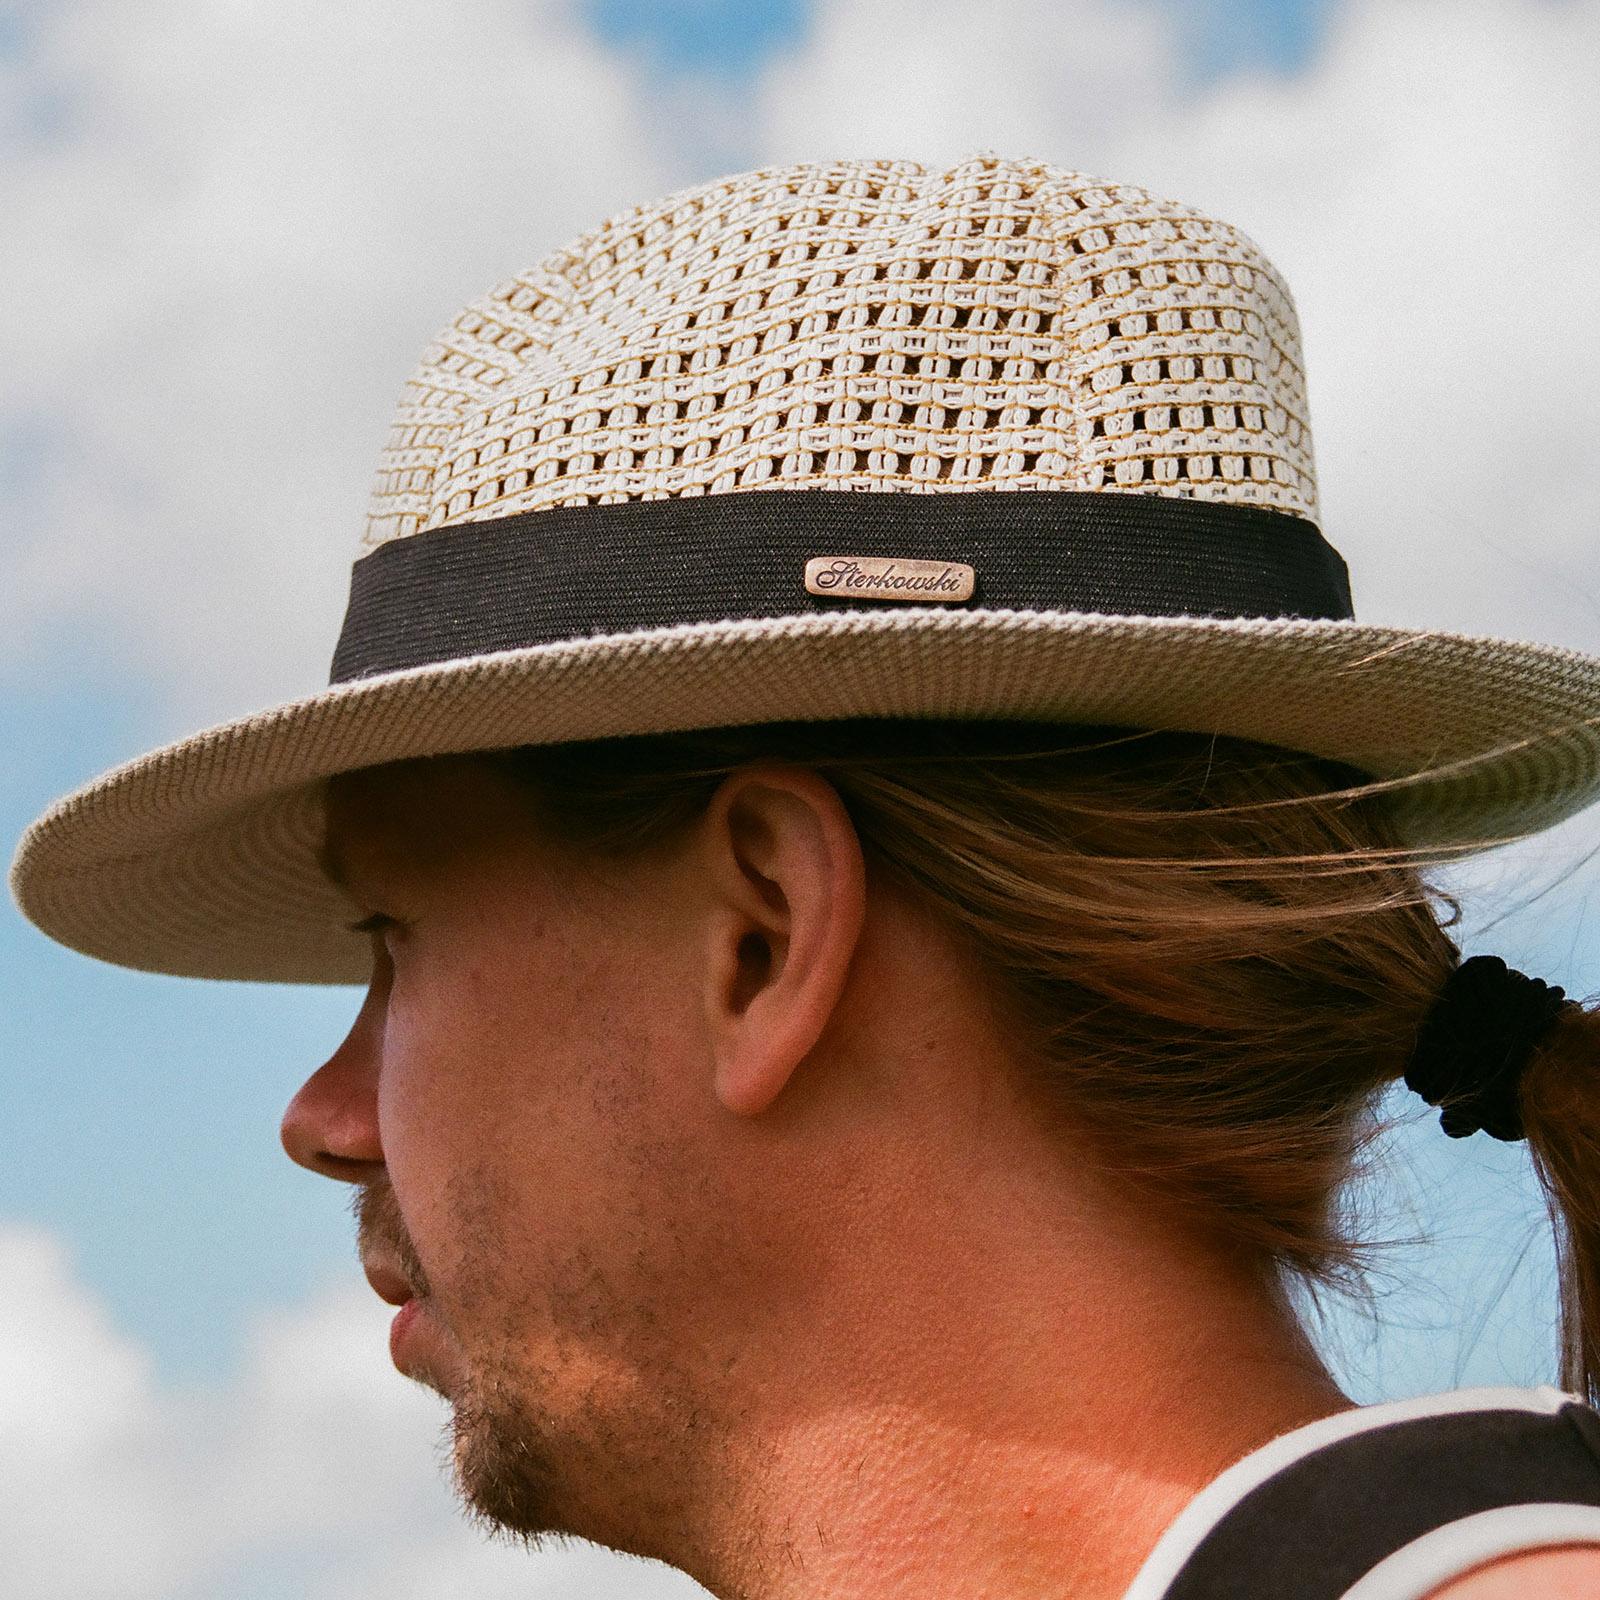 Openwork linen summer fedora hat wide brim linen sewn sun vented band beach festival resort vacation airy lightweight holiday